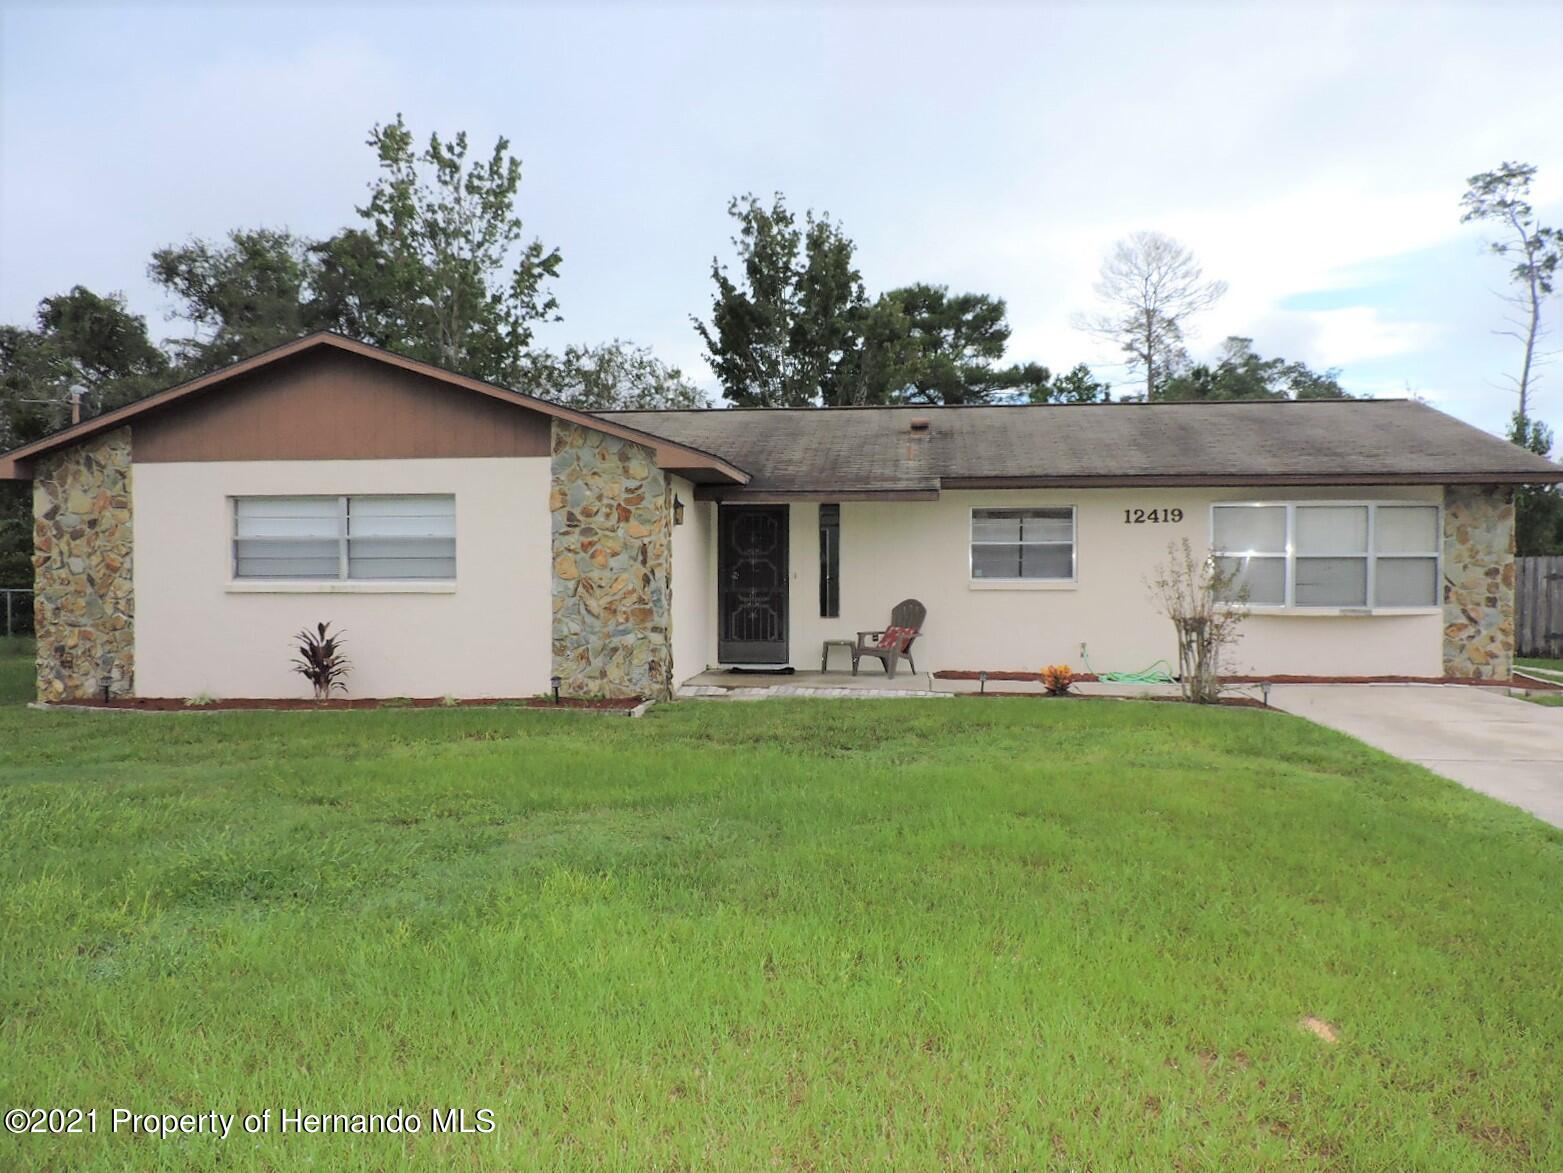 Details for 12419 Tansboro Street, Spring Hill, FL 34608